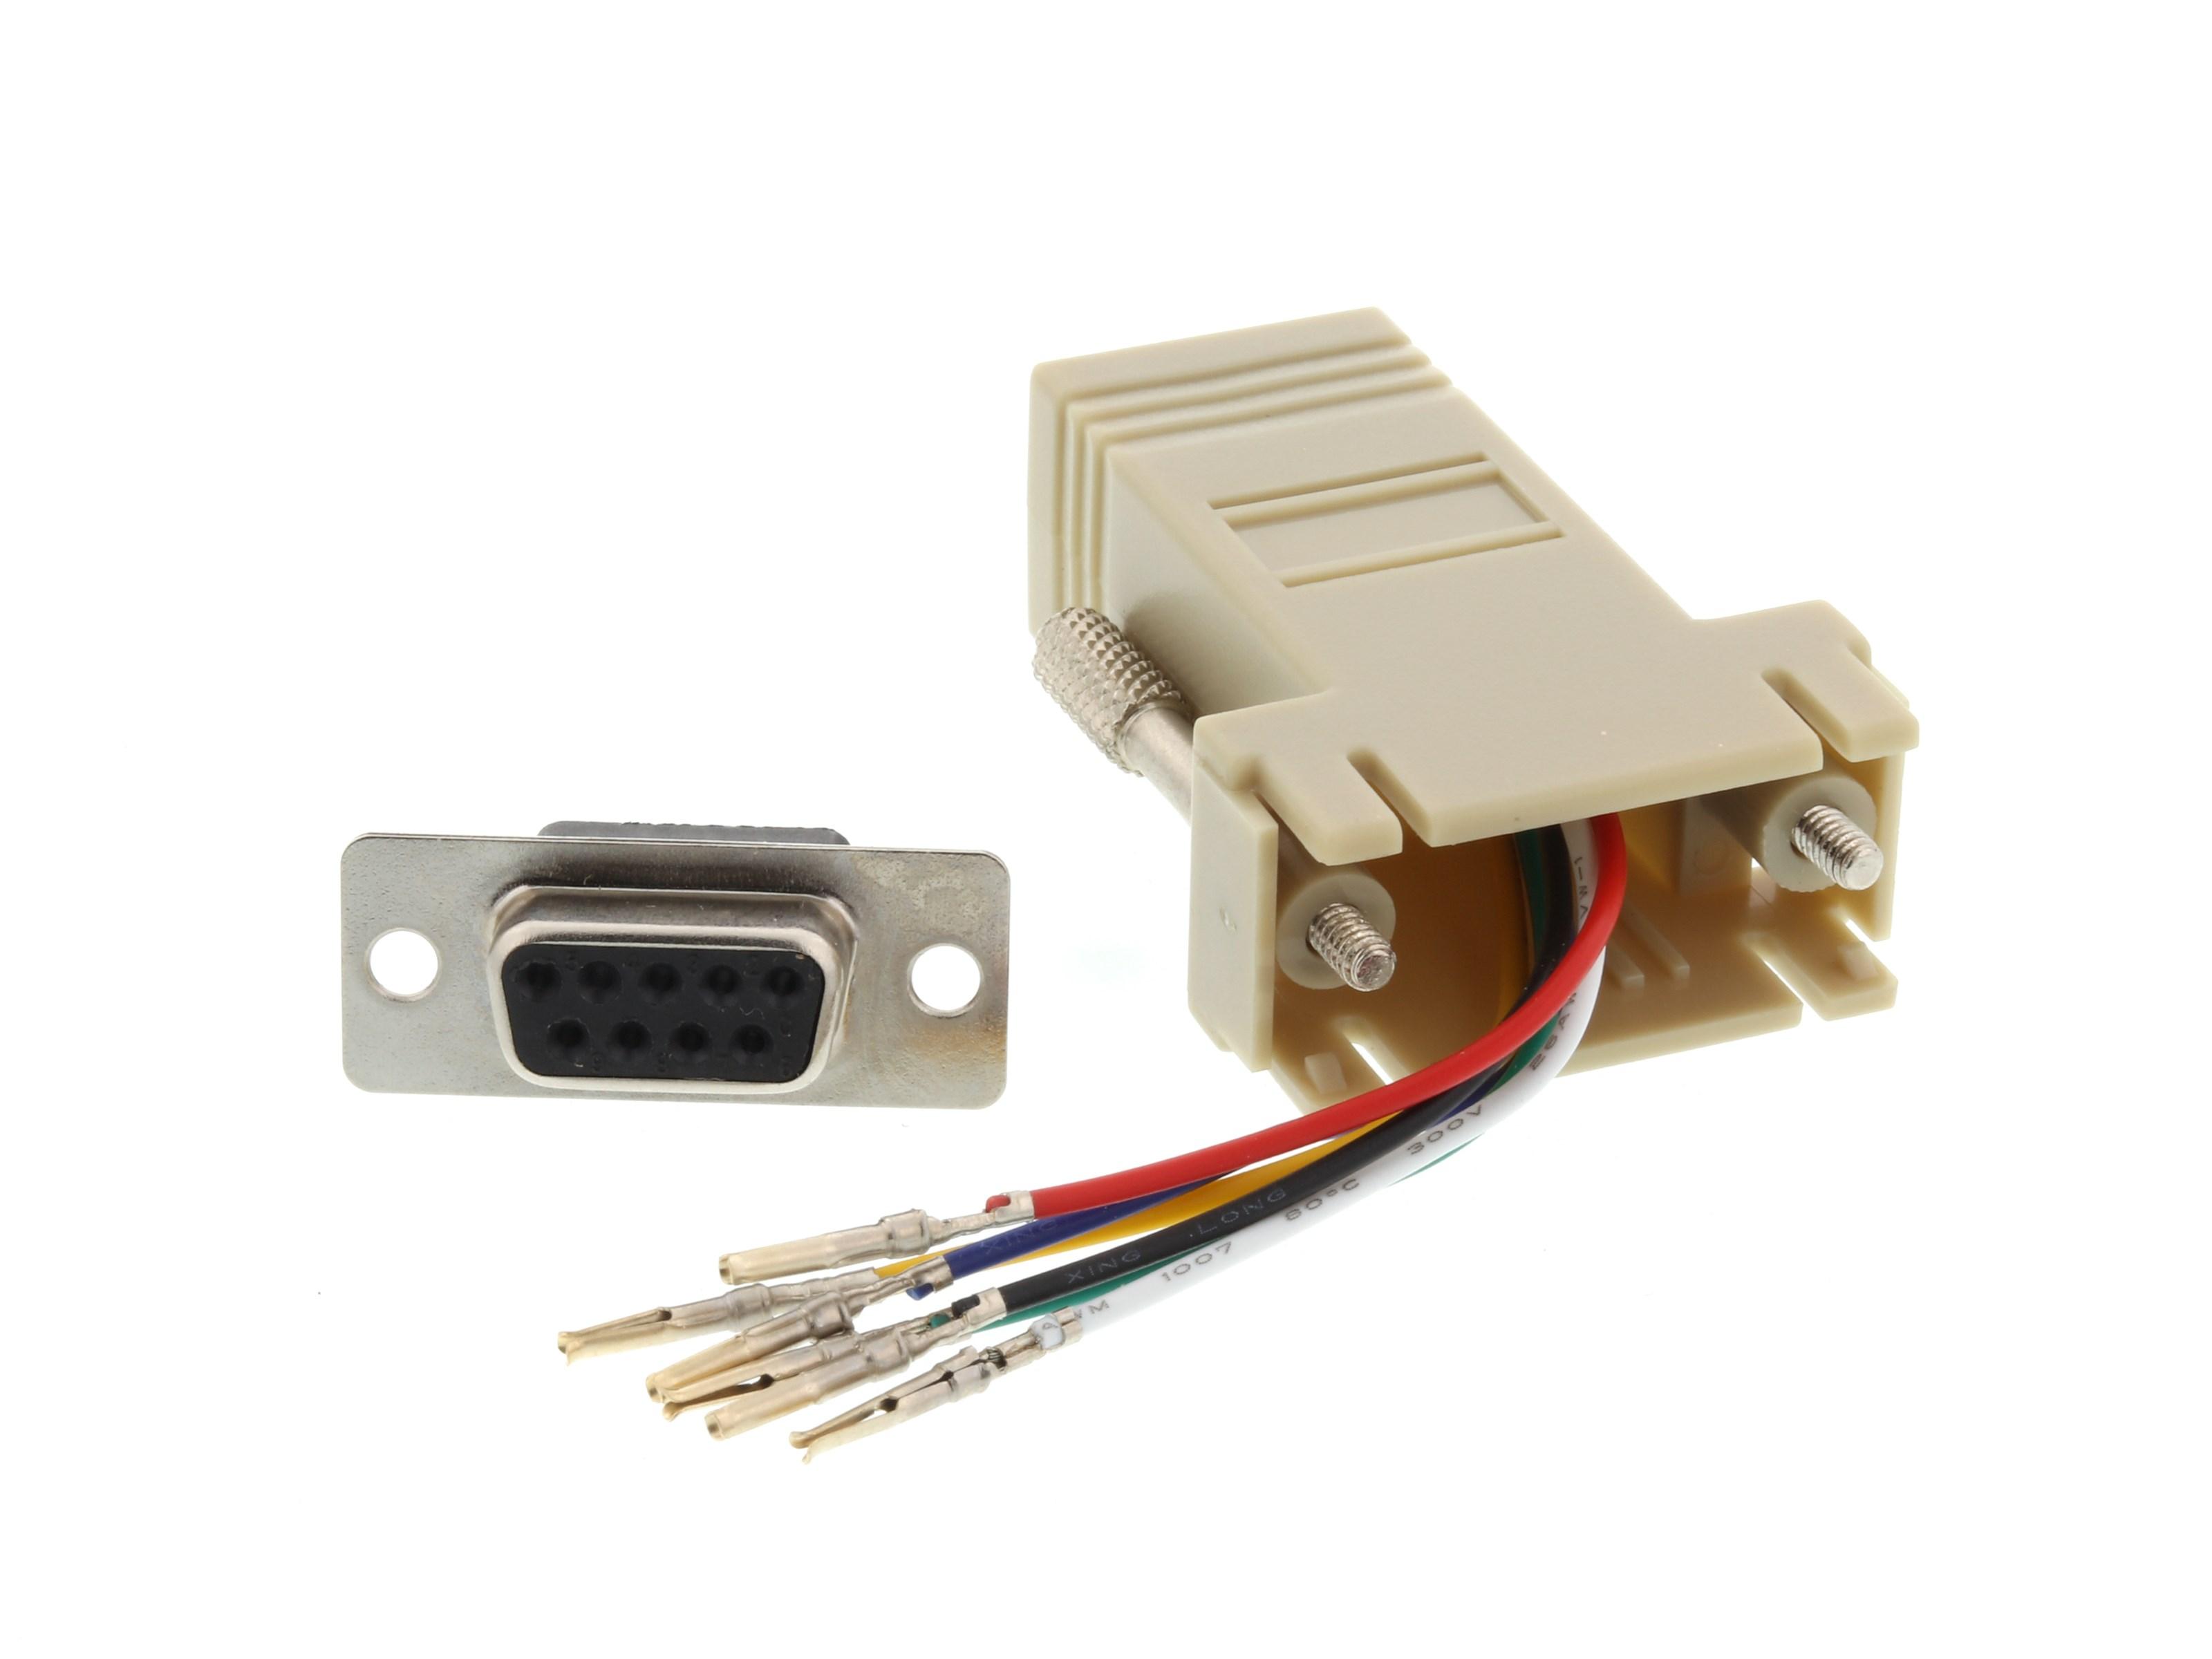 modular adapter kit db9 female to rj11 rj12 beige. Black Bedroom Furniture Sets. Home Design Ideas